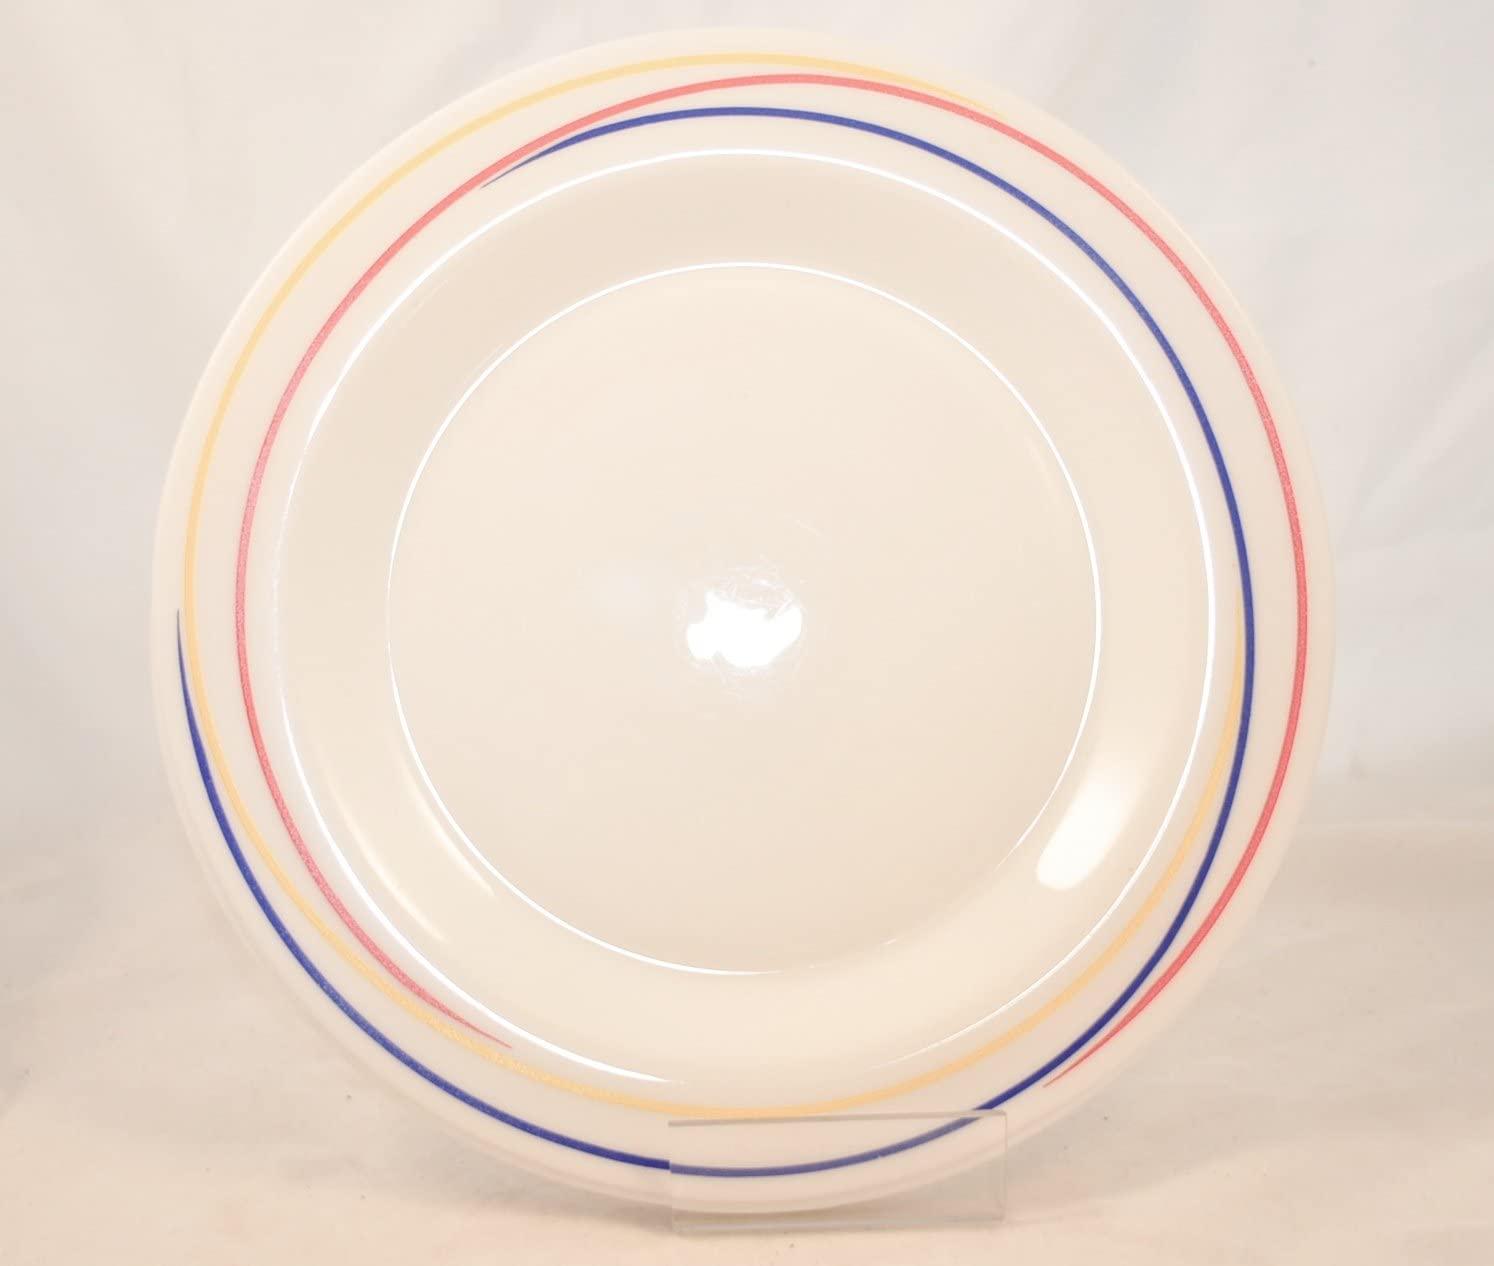 Arcopal vs Corelle dinnerware set comparison